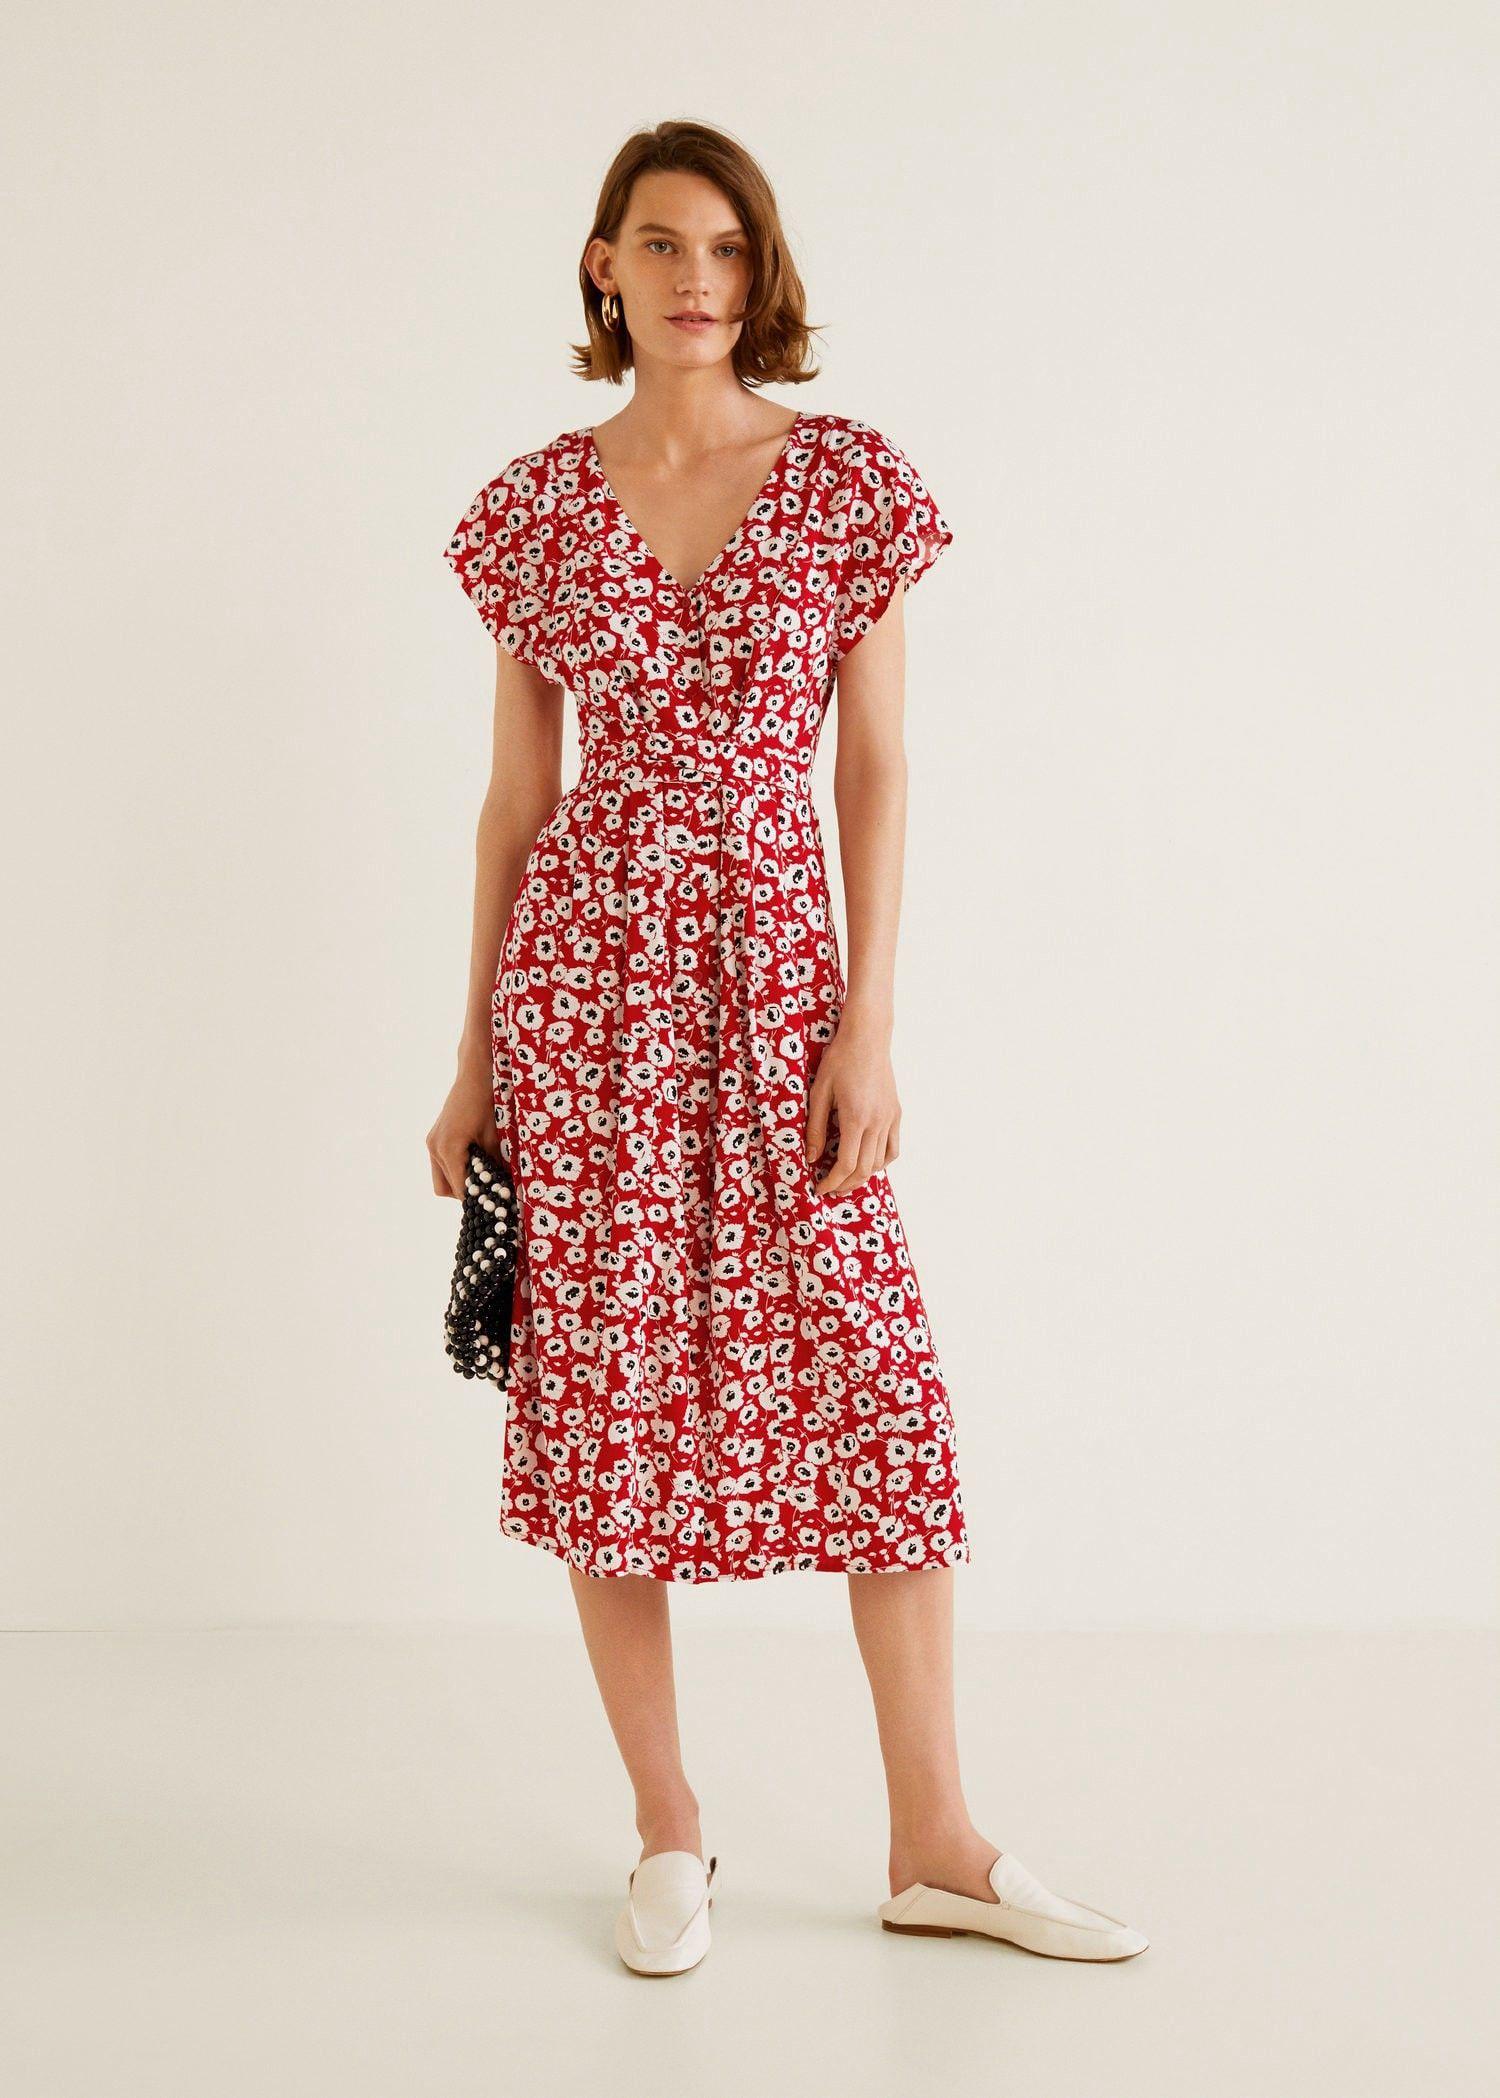 6b3d165fc6 Mango Flower Print Dress - Dark Navy 8